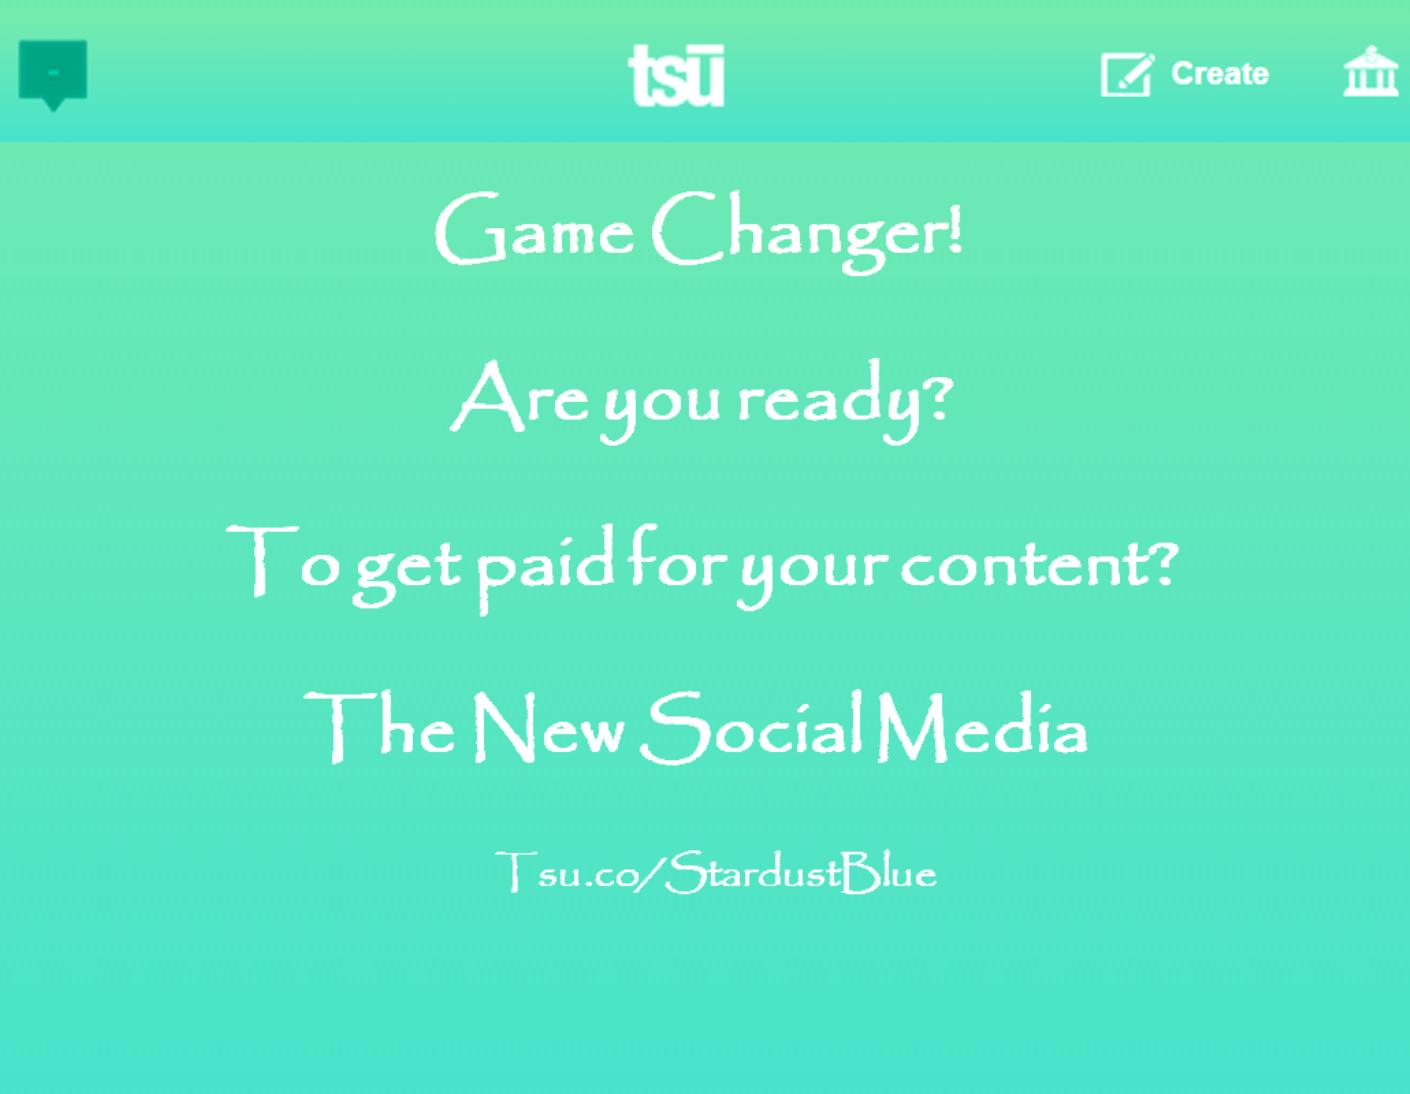 Social Network එකක් තුලින් මුදල් උපයමු